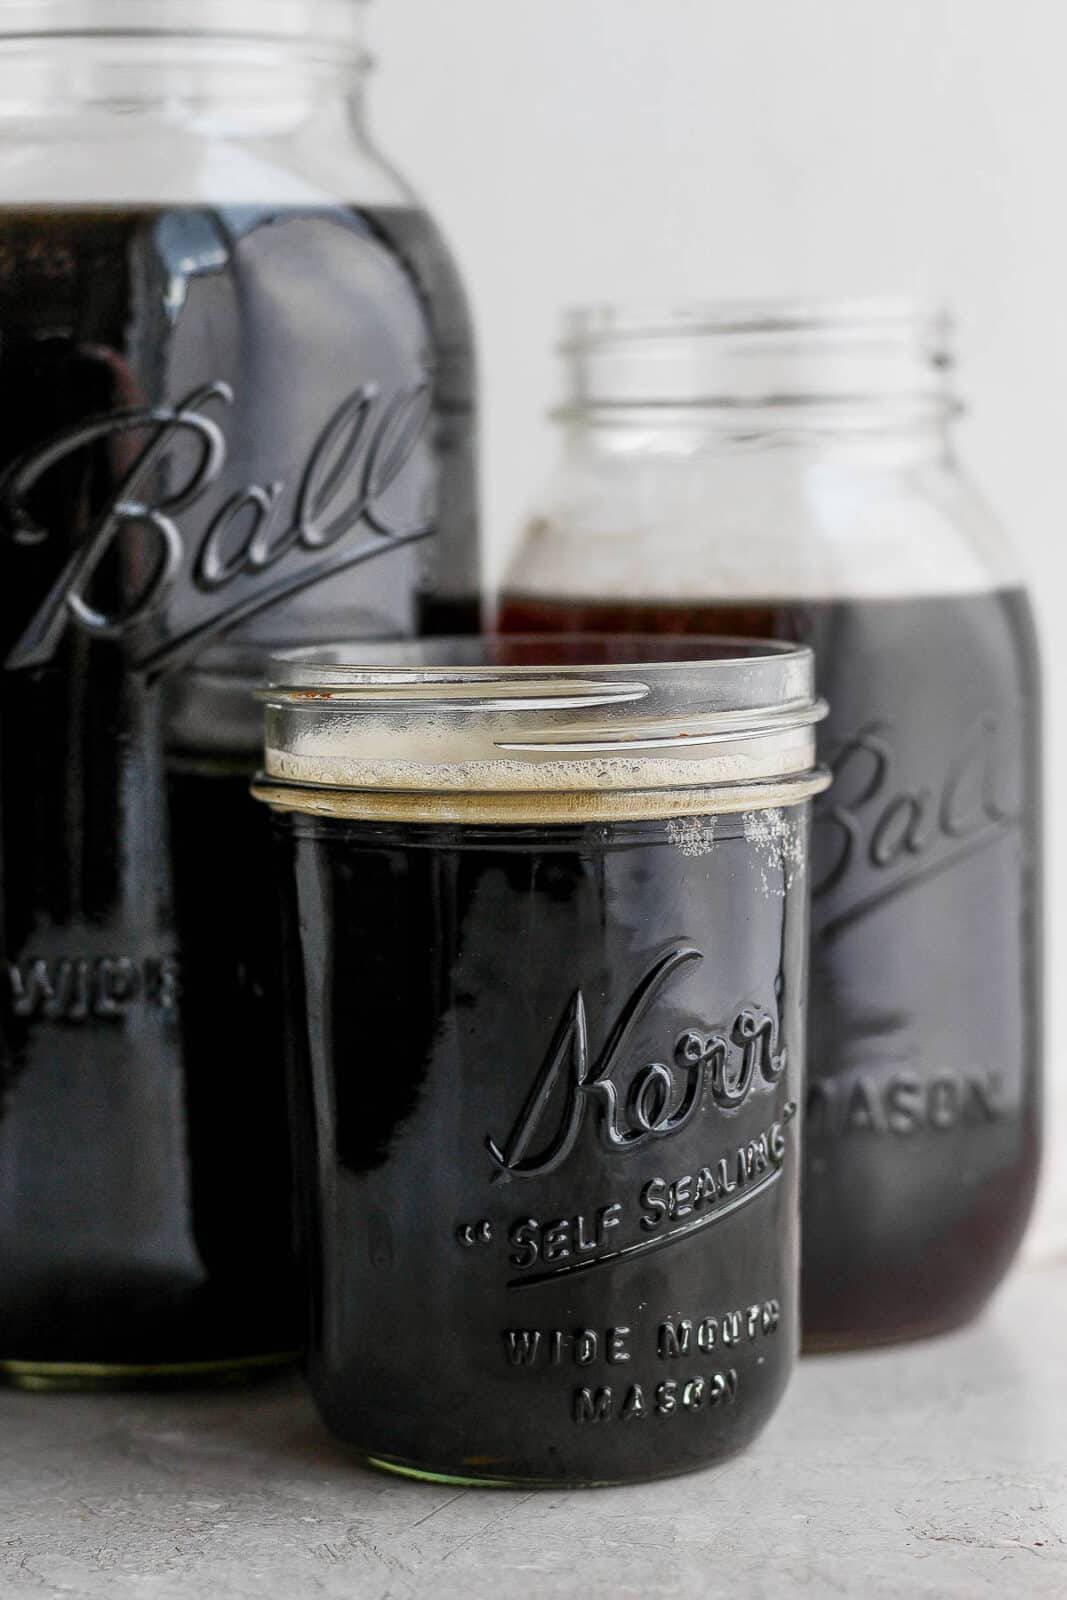 Three jars of cold brew coffee.